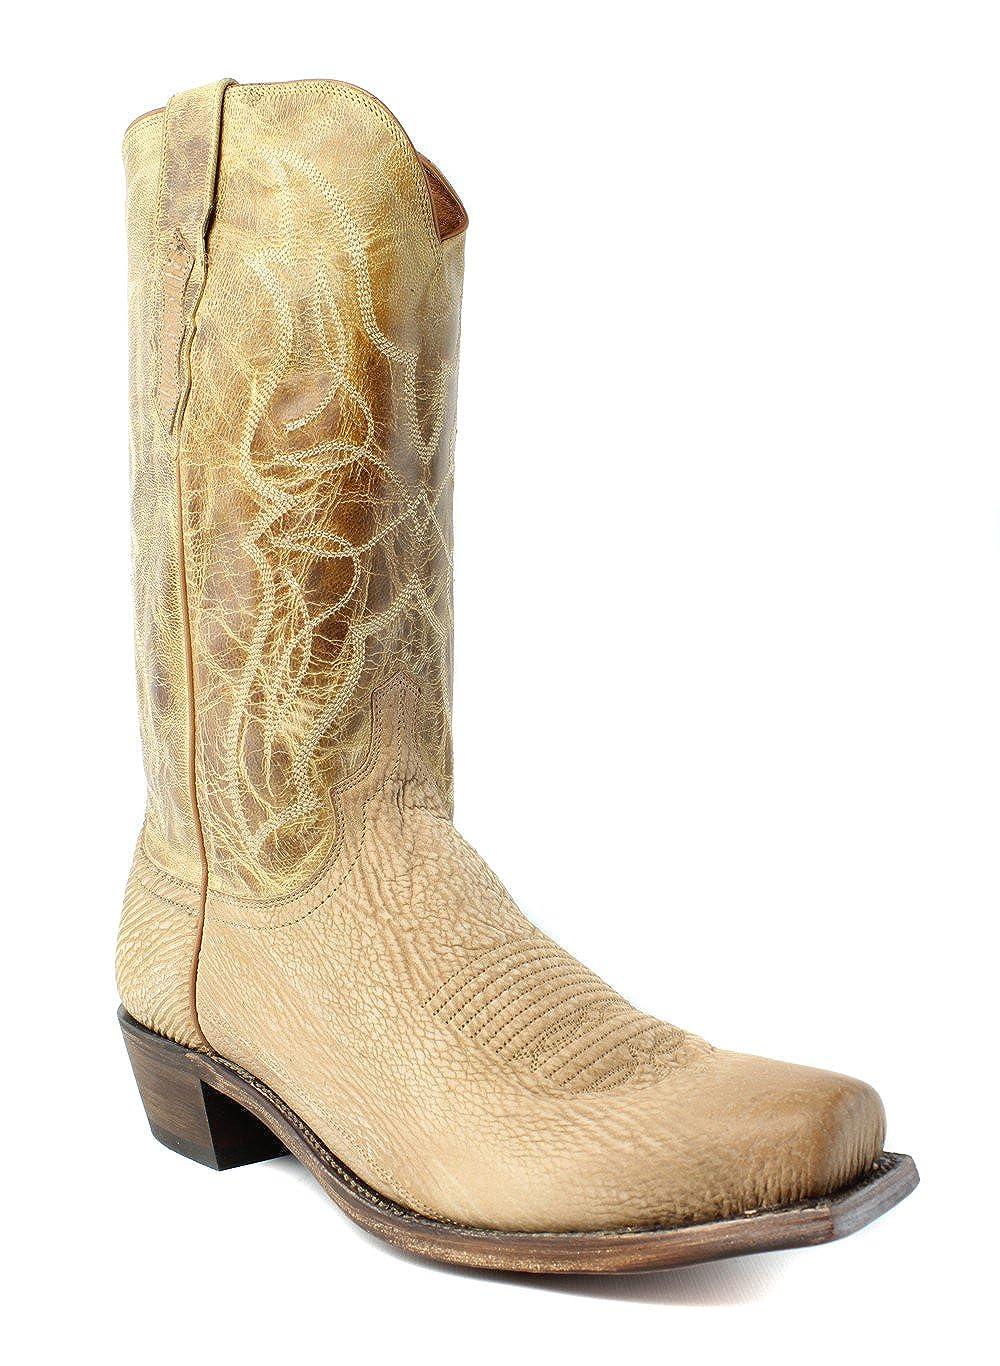 52b5e2f5033 Amazon.com   Lucchese New Mens M3190.74 Tan Cowboy, Western Boots ...